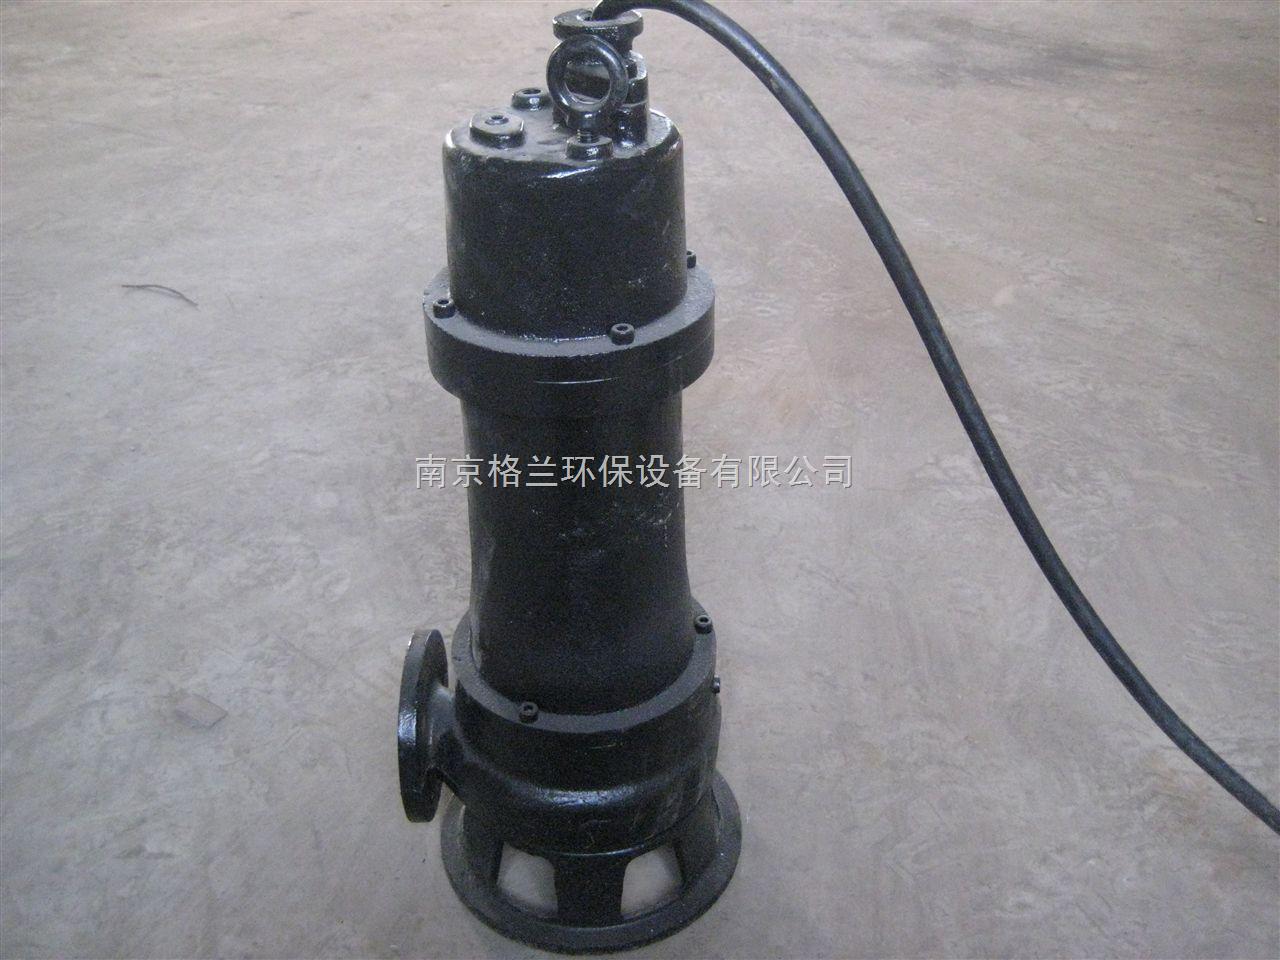 5kw单相绞刀潜水排污泵